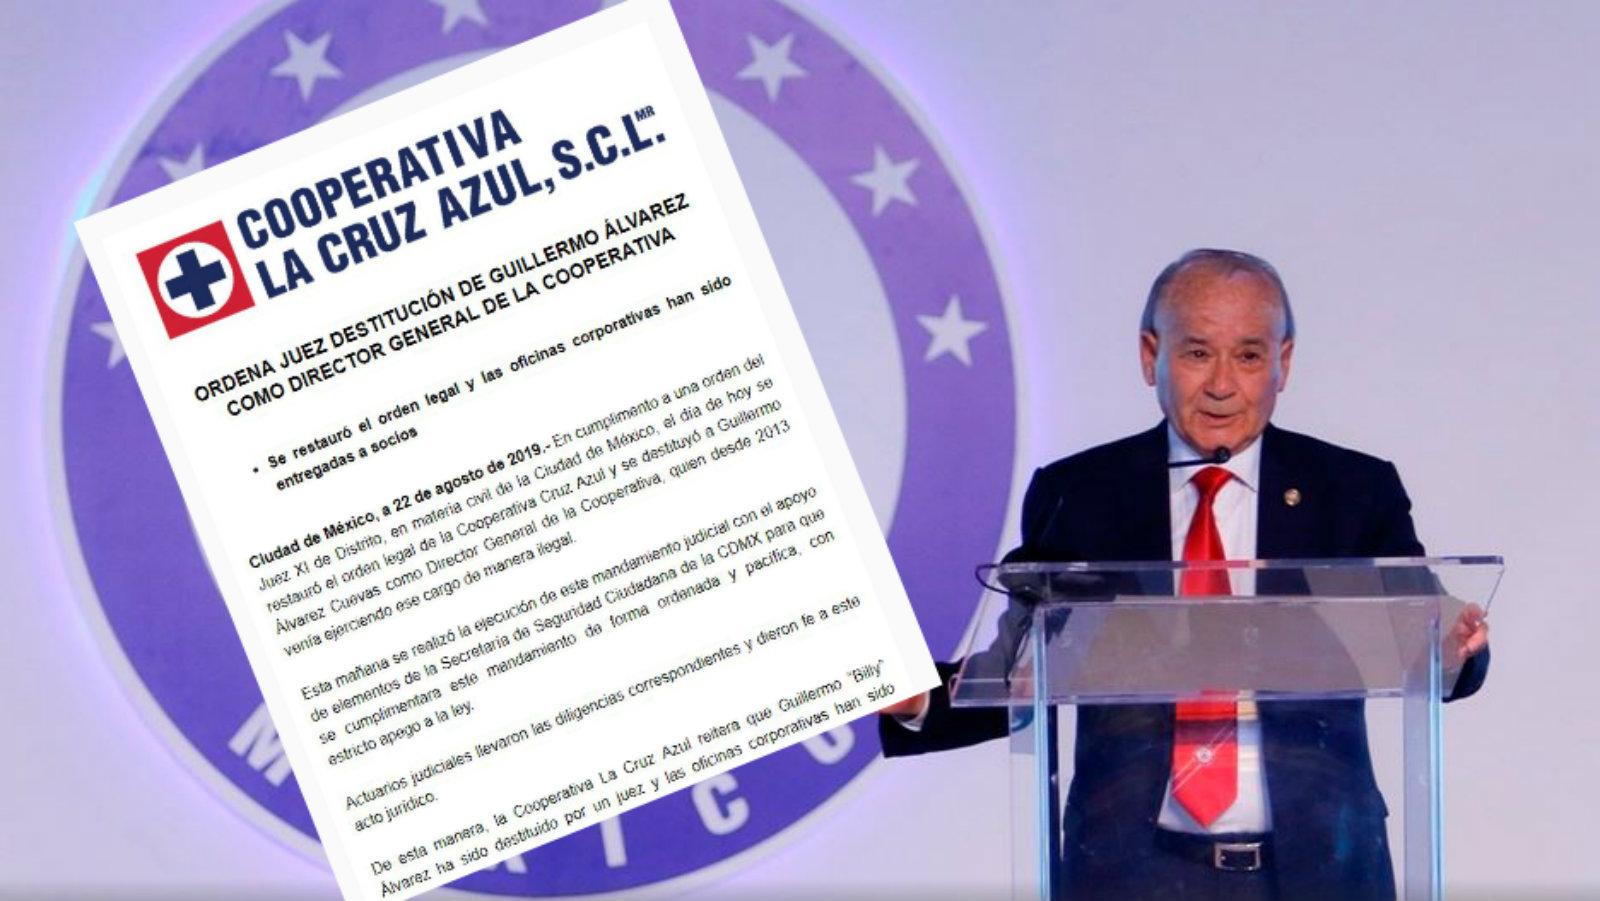 Guillermo Álvarez destituido cruz azul cooperativa vocero juez